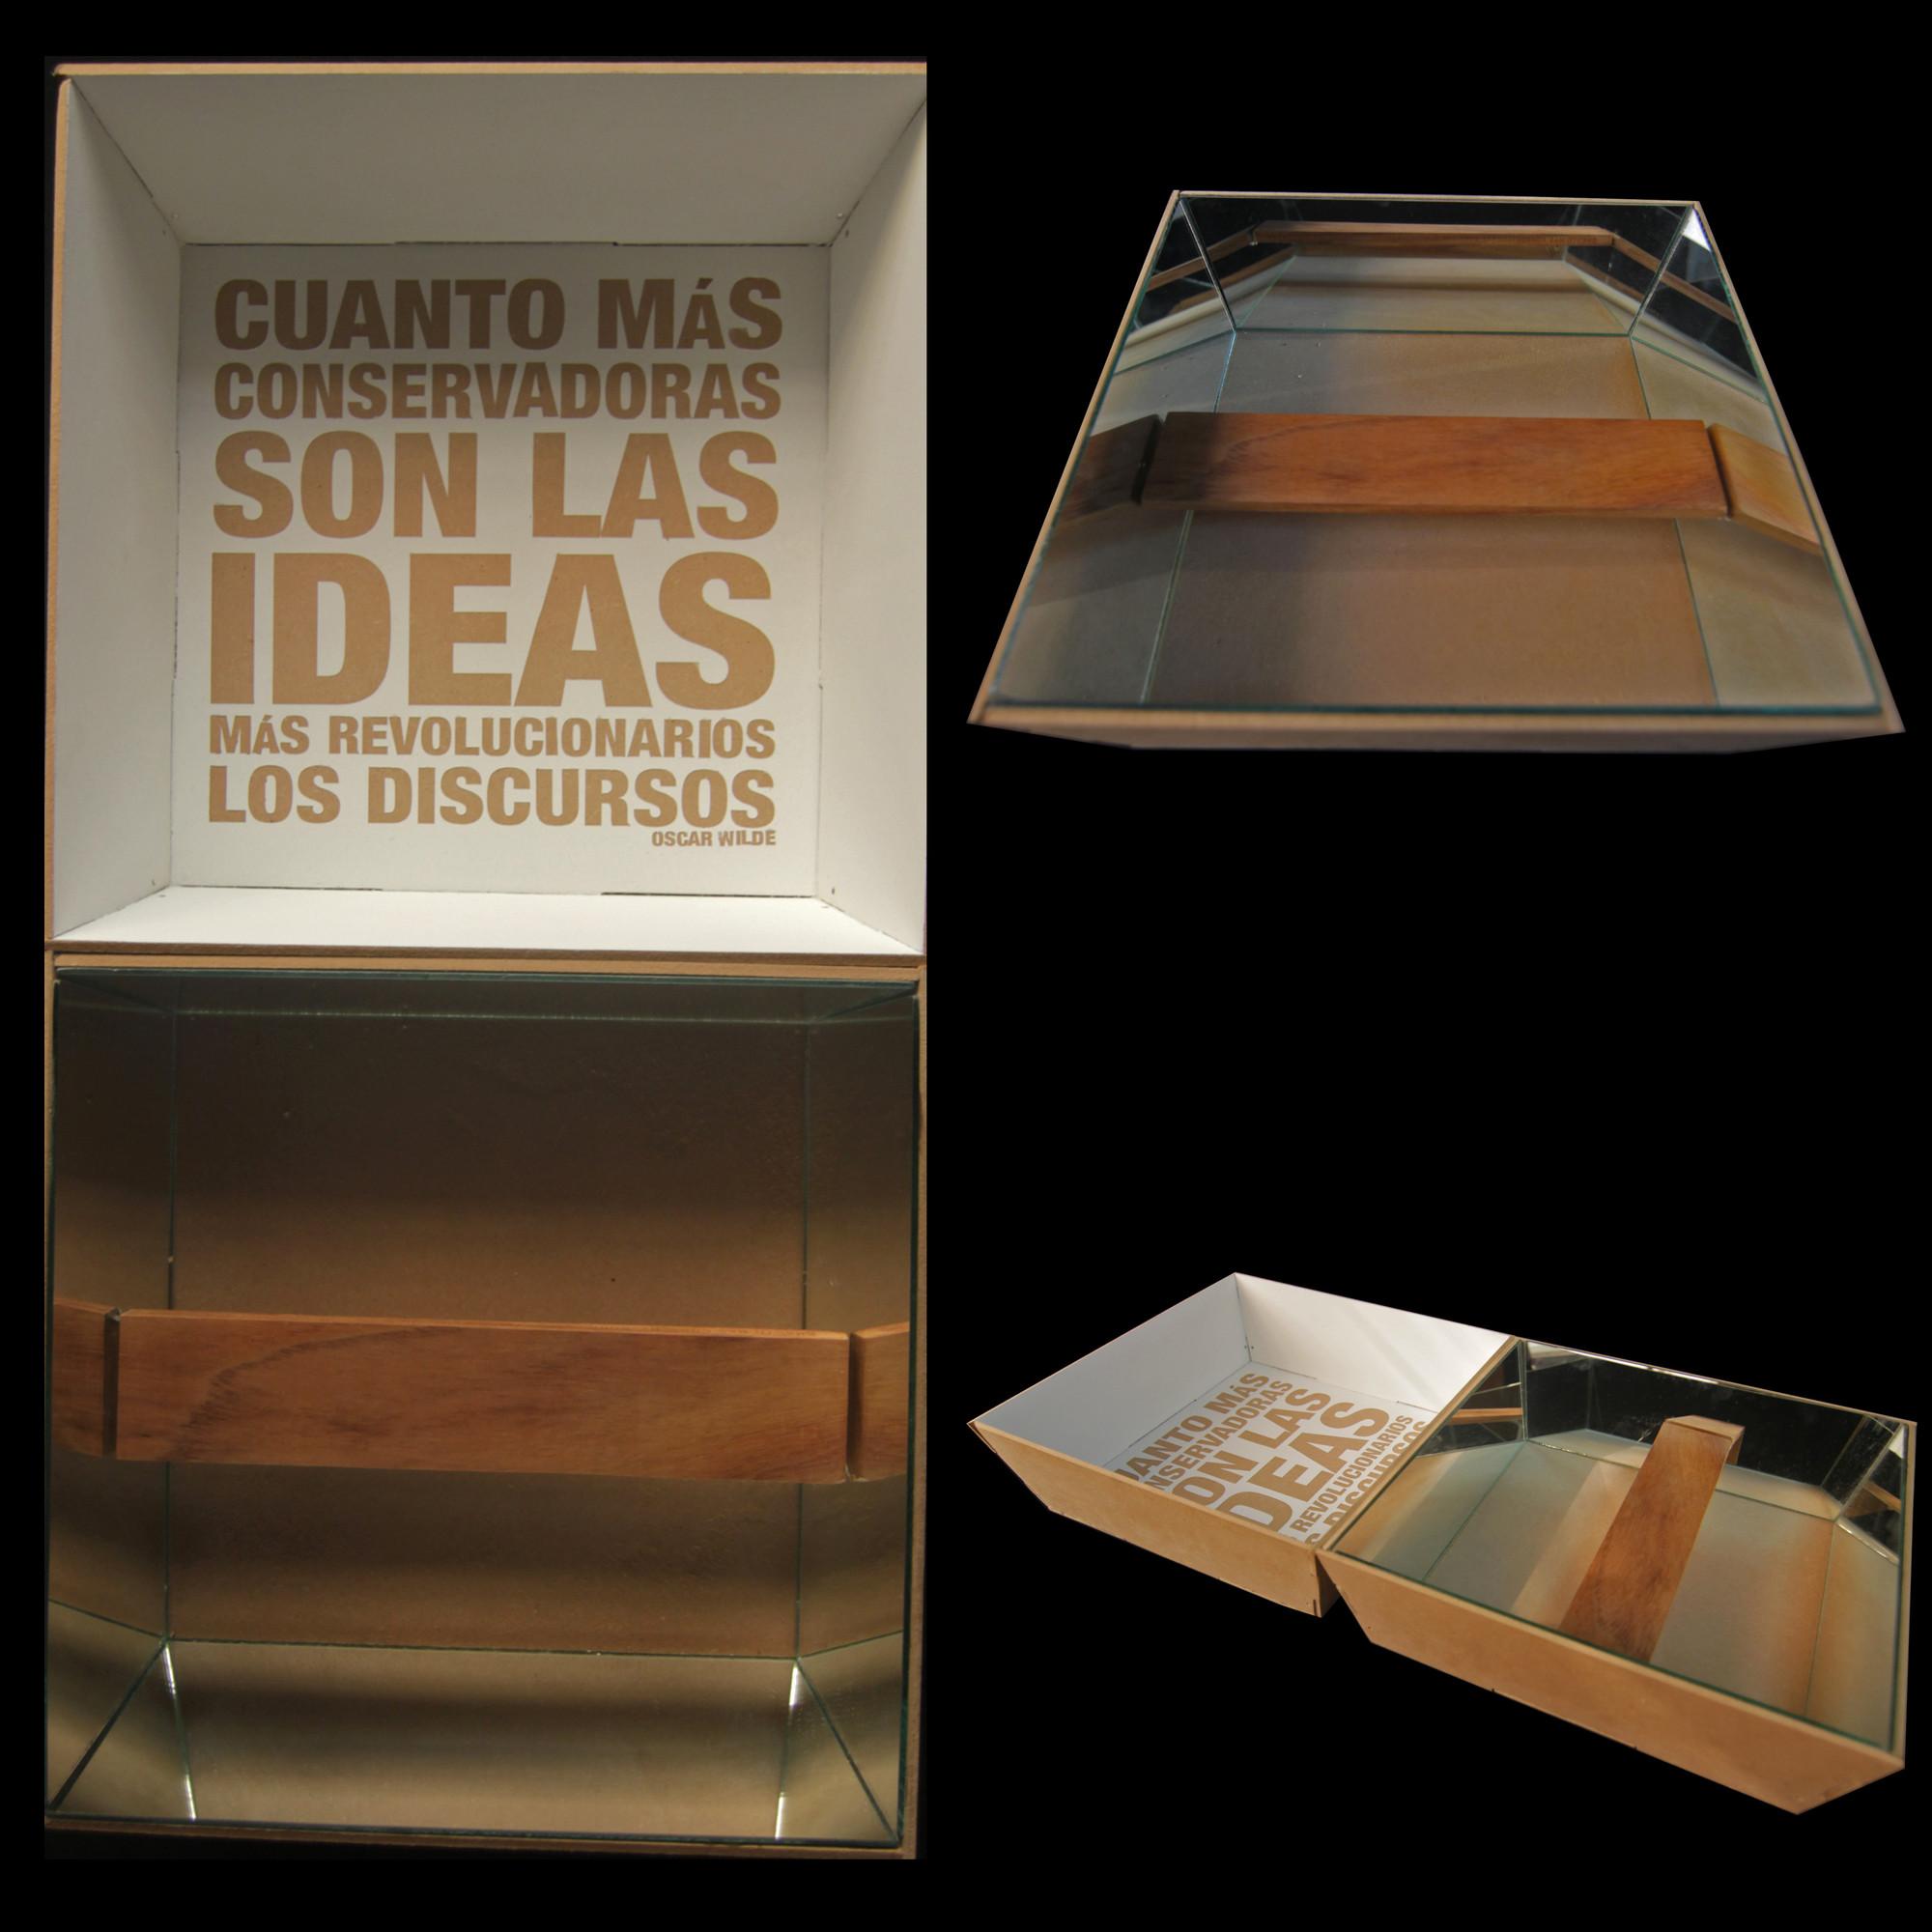 Pieza-Caja de Luis Aldrete